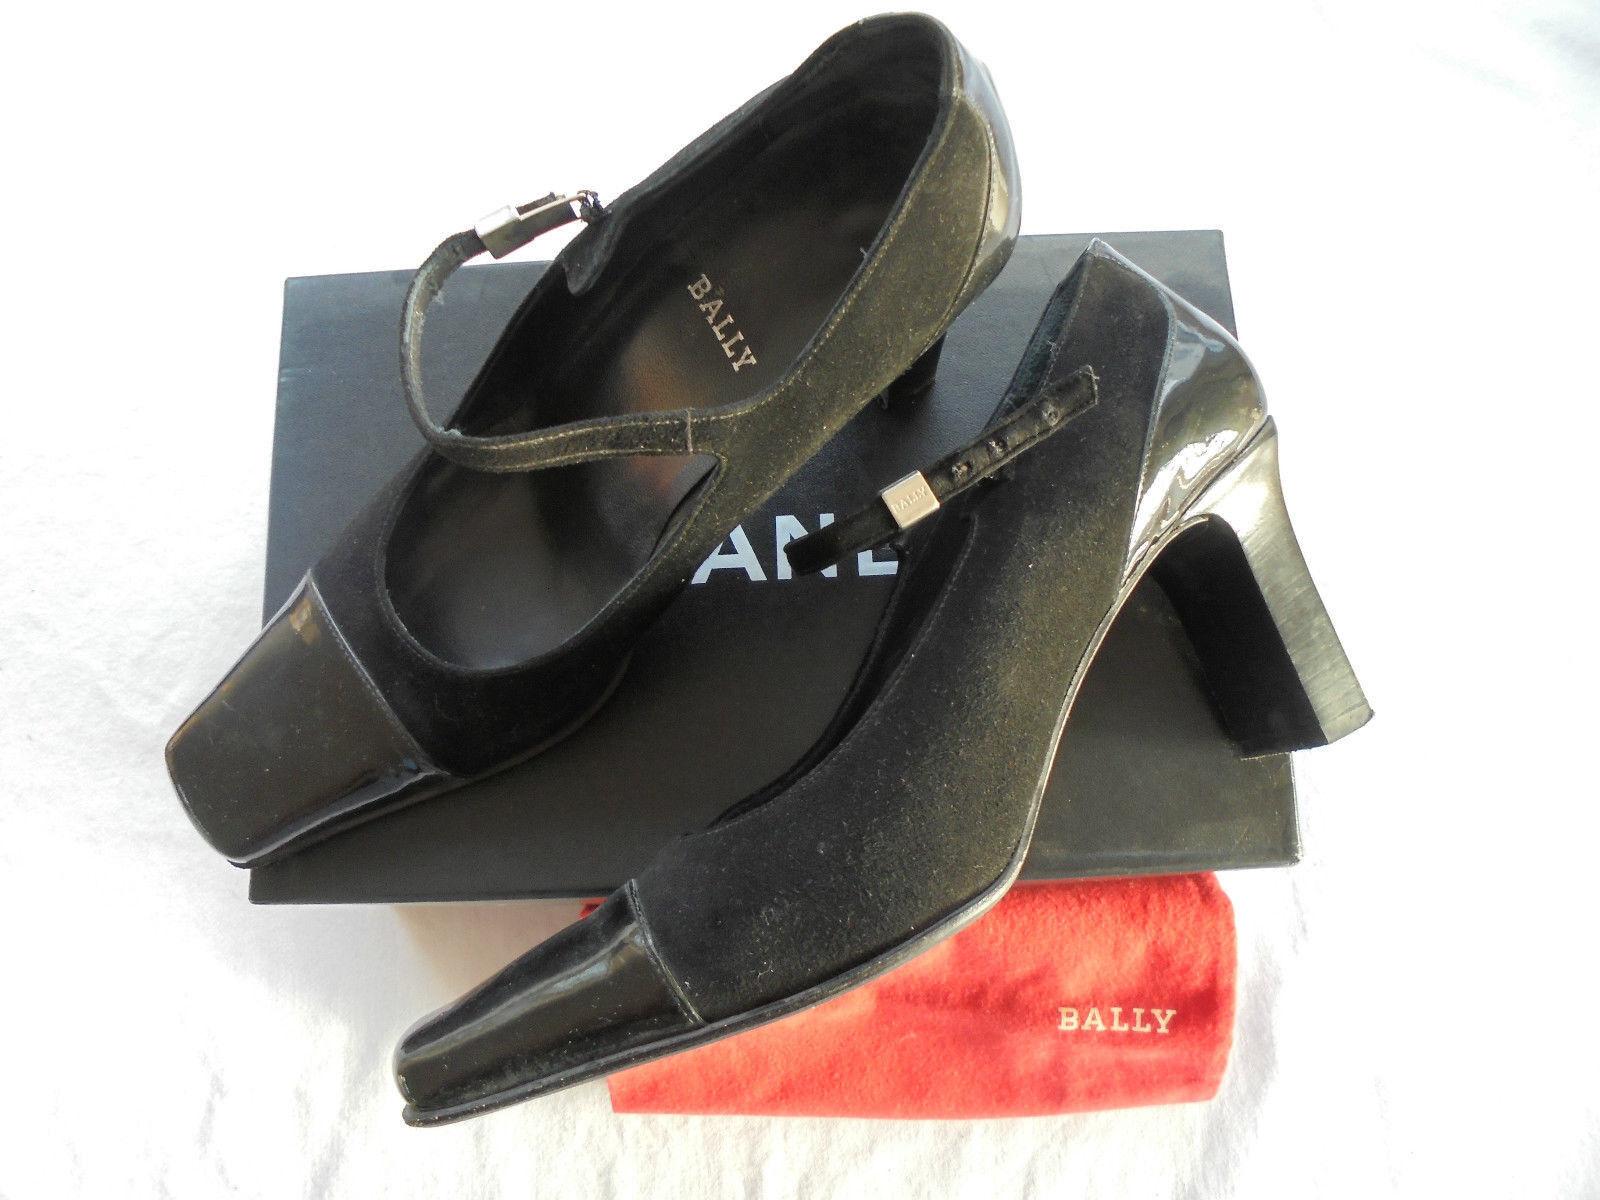 Bally Designer Lackleder Pumps NP  Sandaletten Schuhe Tasche Gr 39